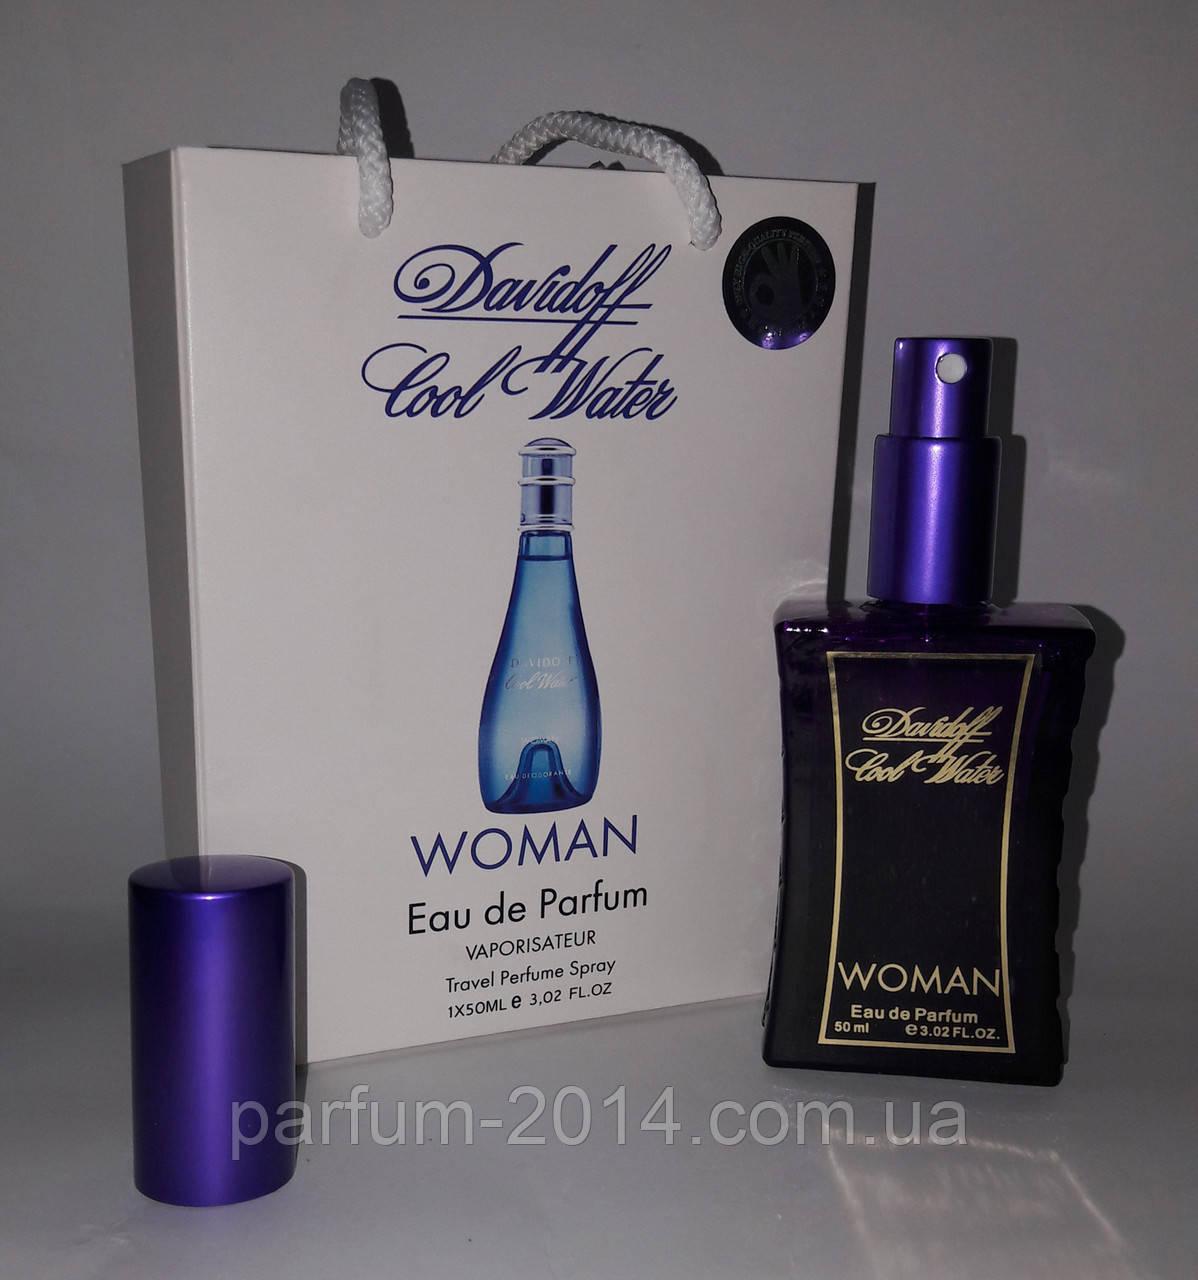 Женский мини парфюм кул вотер Cool Water woman в подарочной упаковке 50 ml (лиц) аромат духи запах пробник